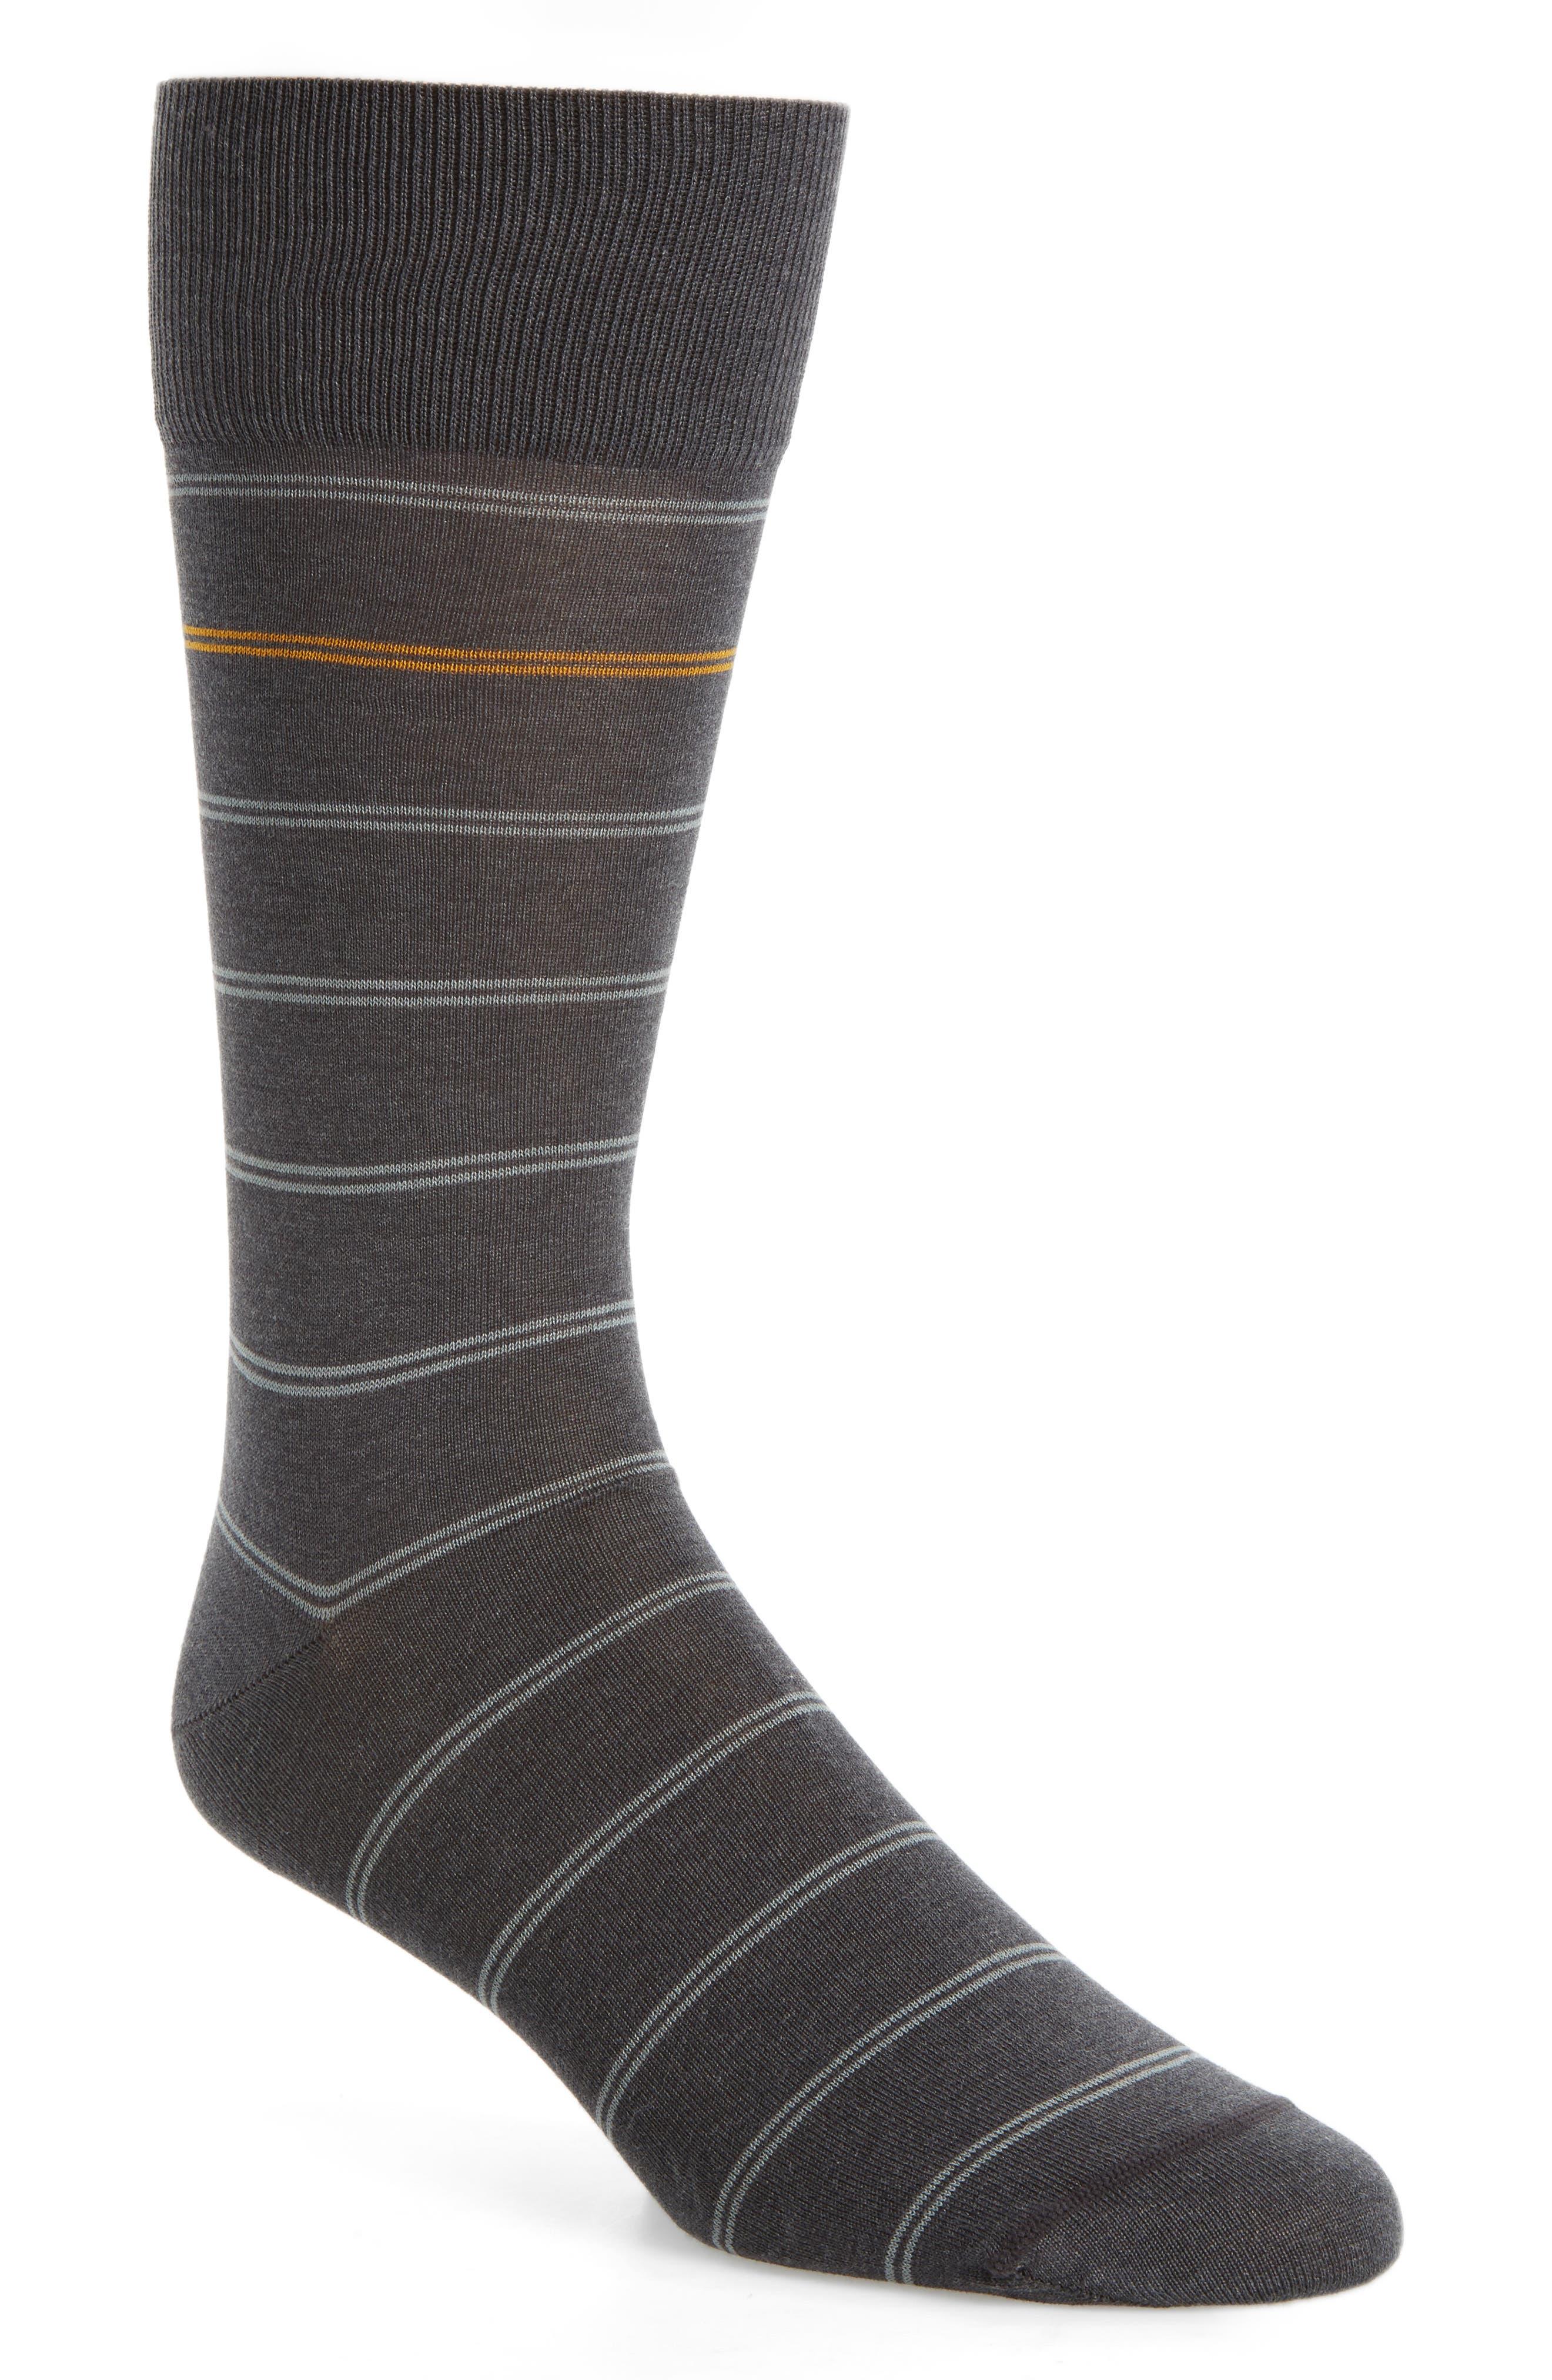 Stripe Socks,                             Main thumbnail 1, color,                             Charcoal/ Grey